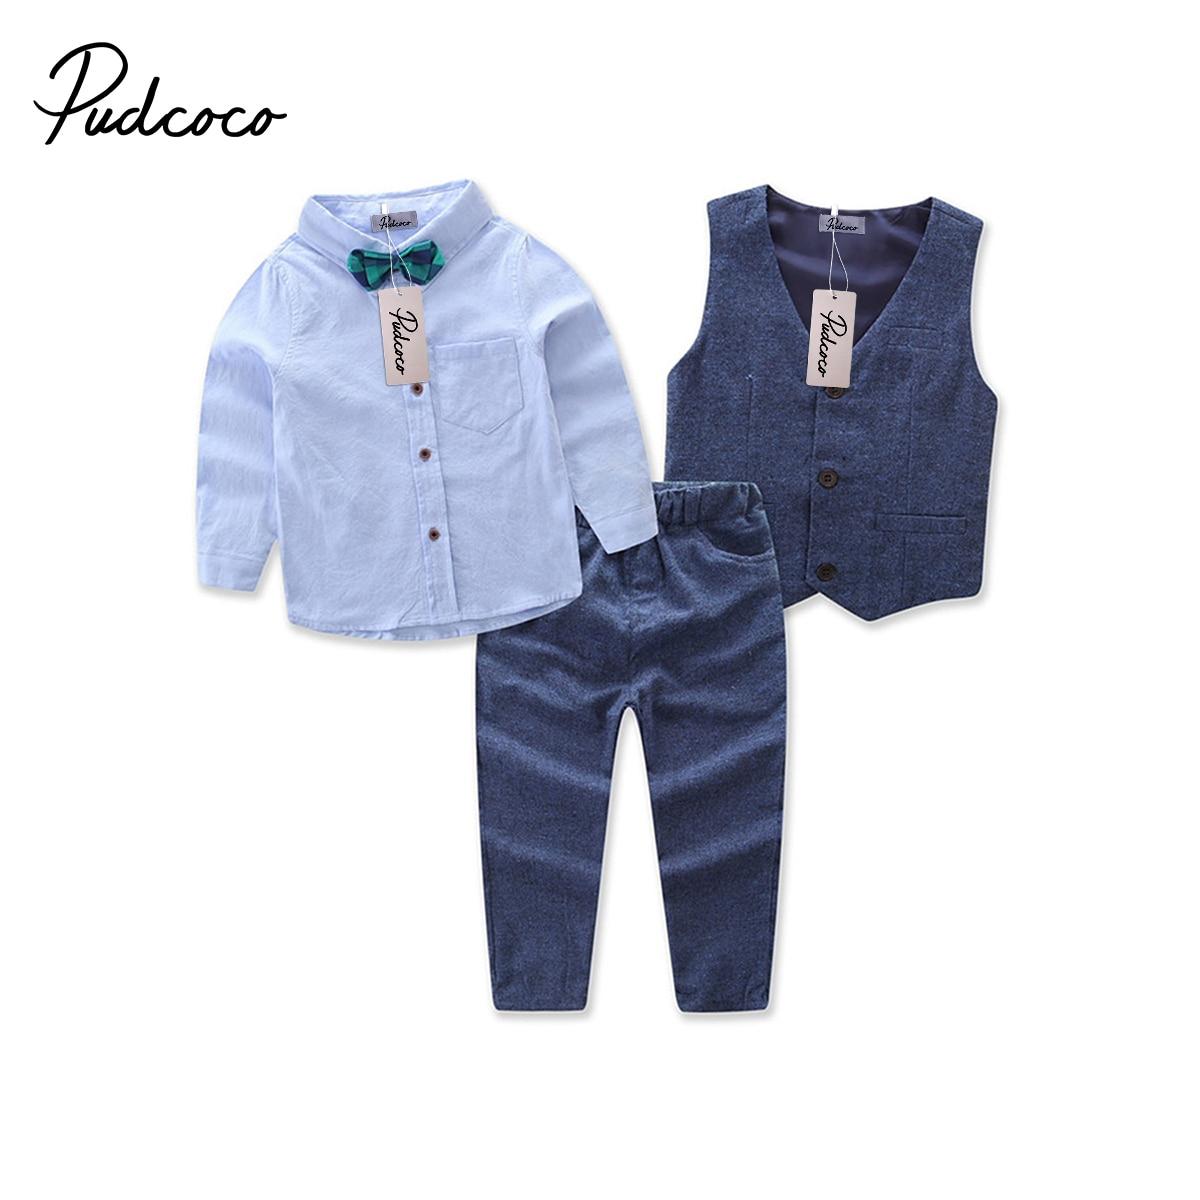 100% Wahr Gentleman Jungen 3 Stücke Mode Kleidung Set Fliege Weste Blau Shirts Lange Hosen Anzug Outfits Herbst Frühling 2-7y Guter Geschmack